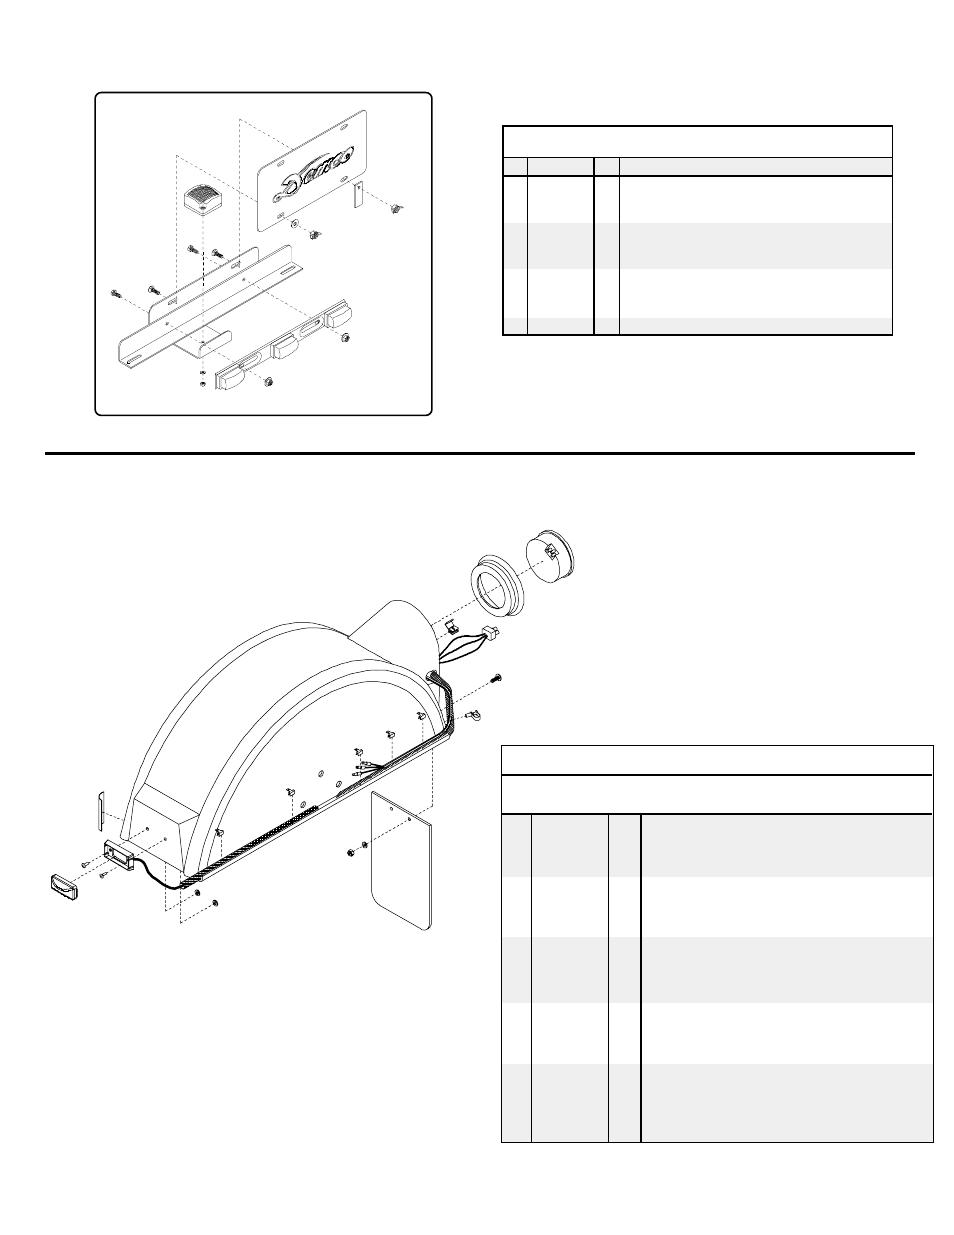 license plate bracket assembly fender assembly parts list demco rh manualsdir com Demco Sprayers Demco Electric